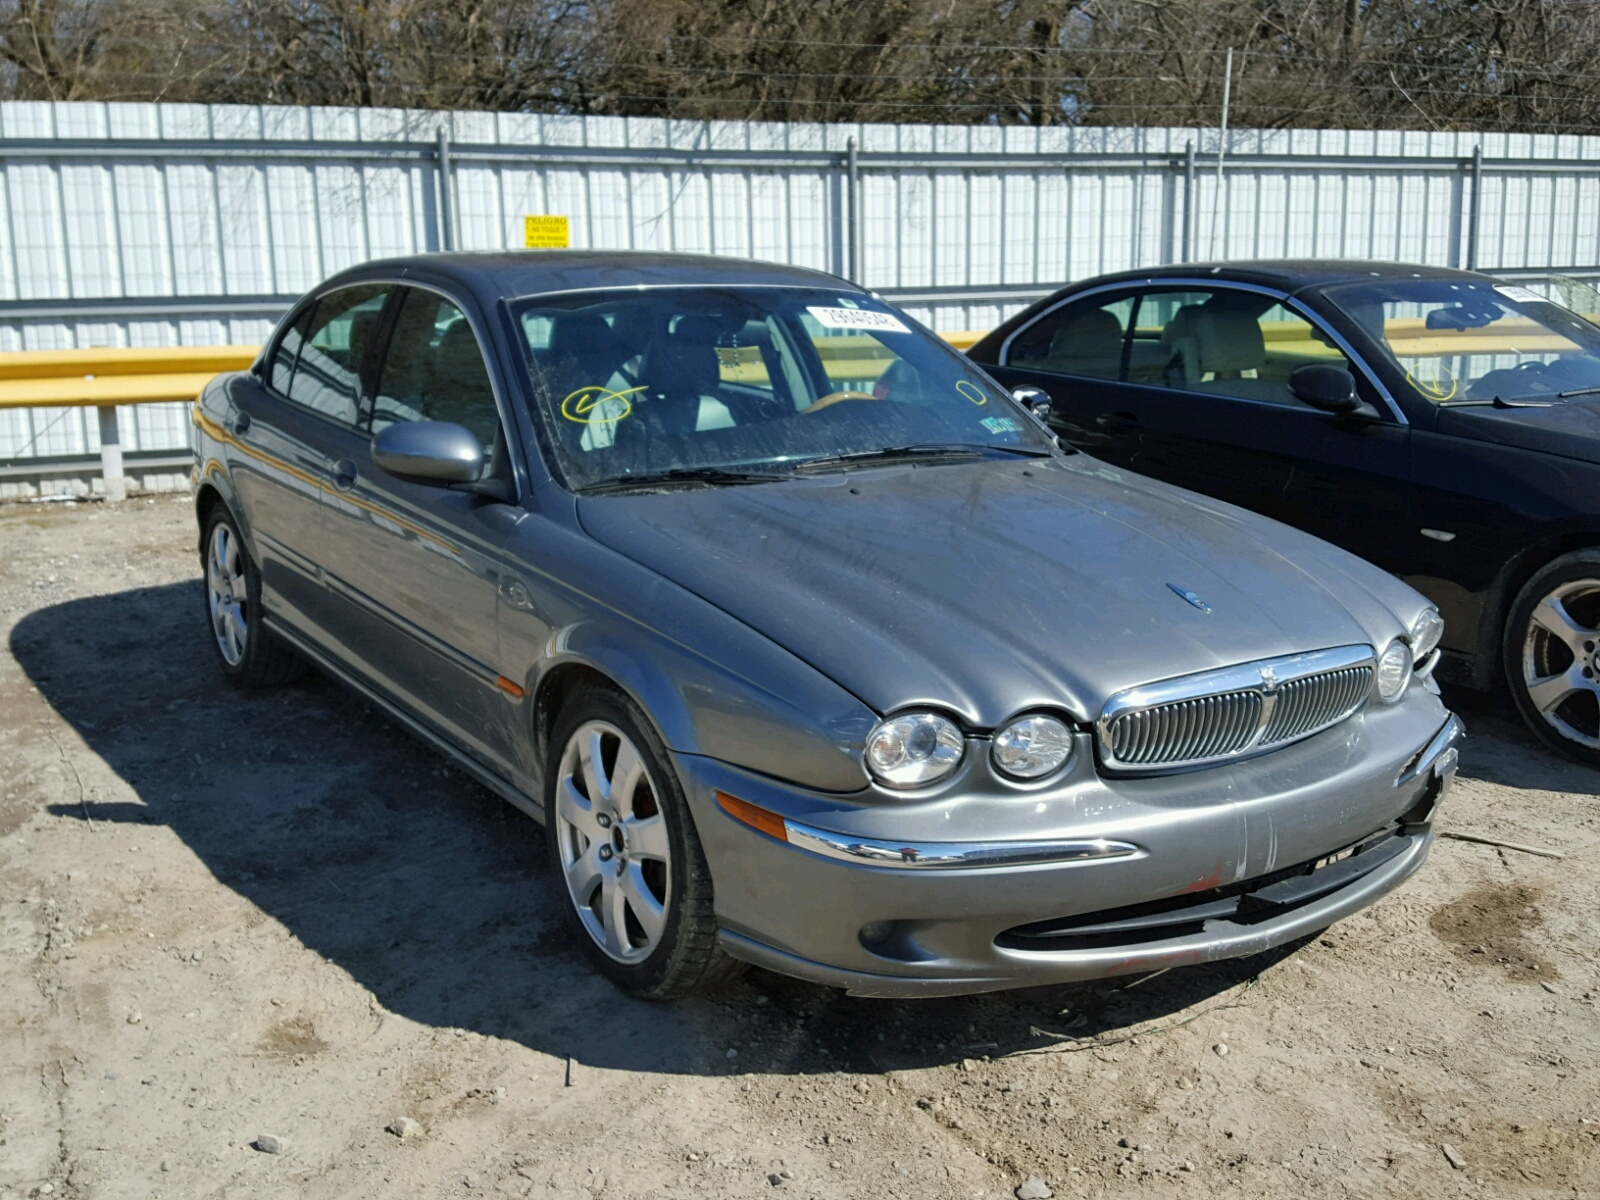 bedford cars on classic xjr near for classics modern virginia jaguar sale car